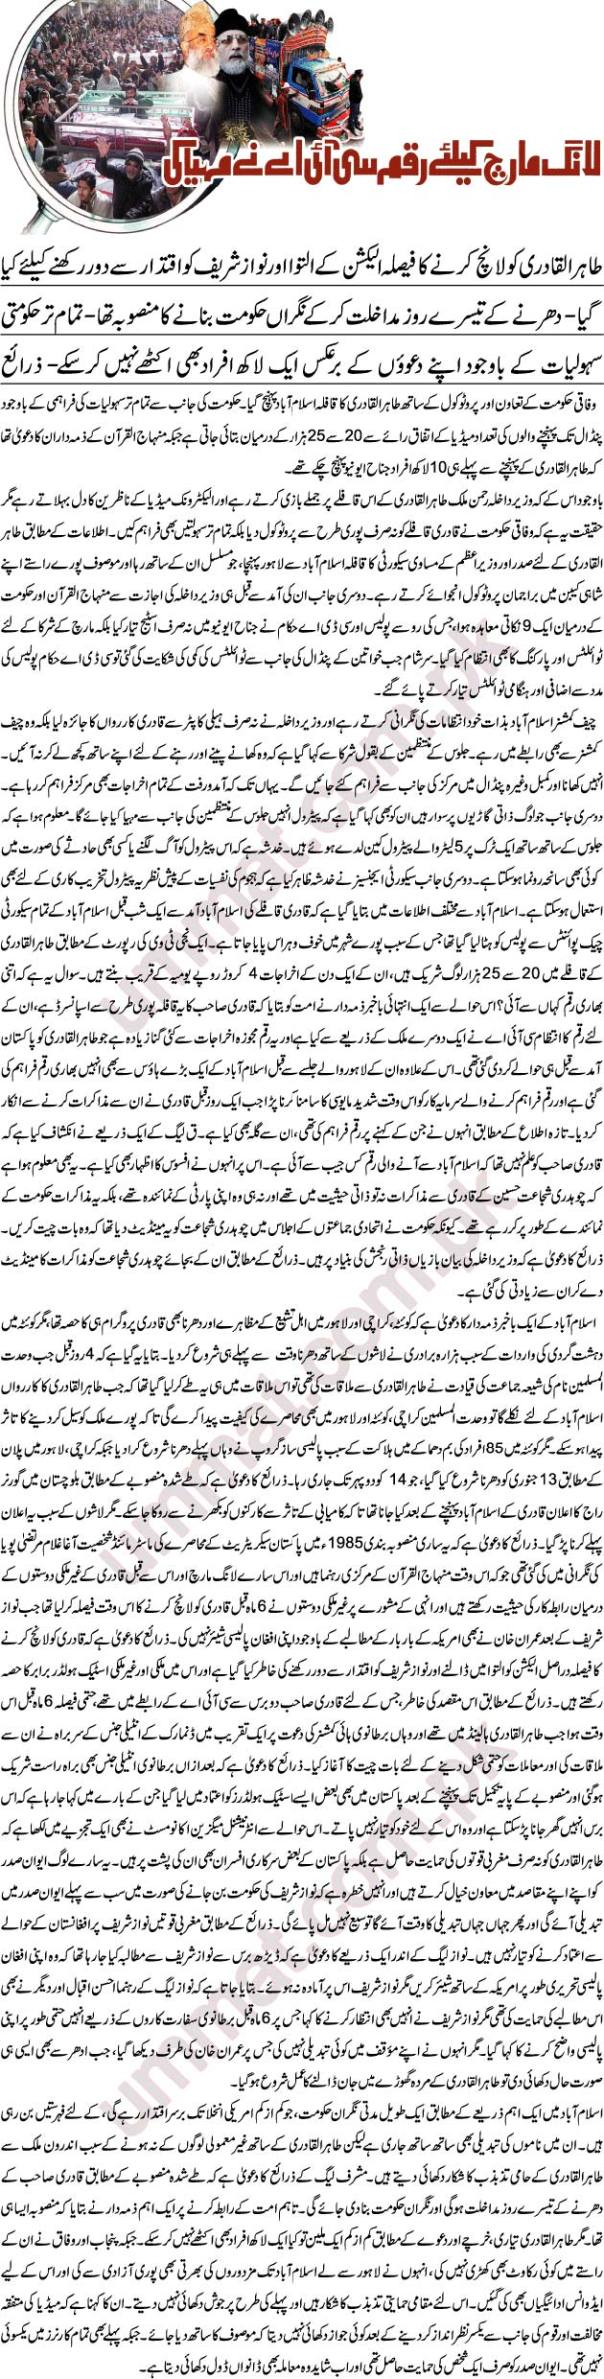 tahir ul qadri march Tahir ul Qadri Long March Funded By CIA, Report